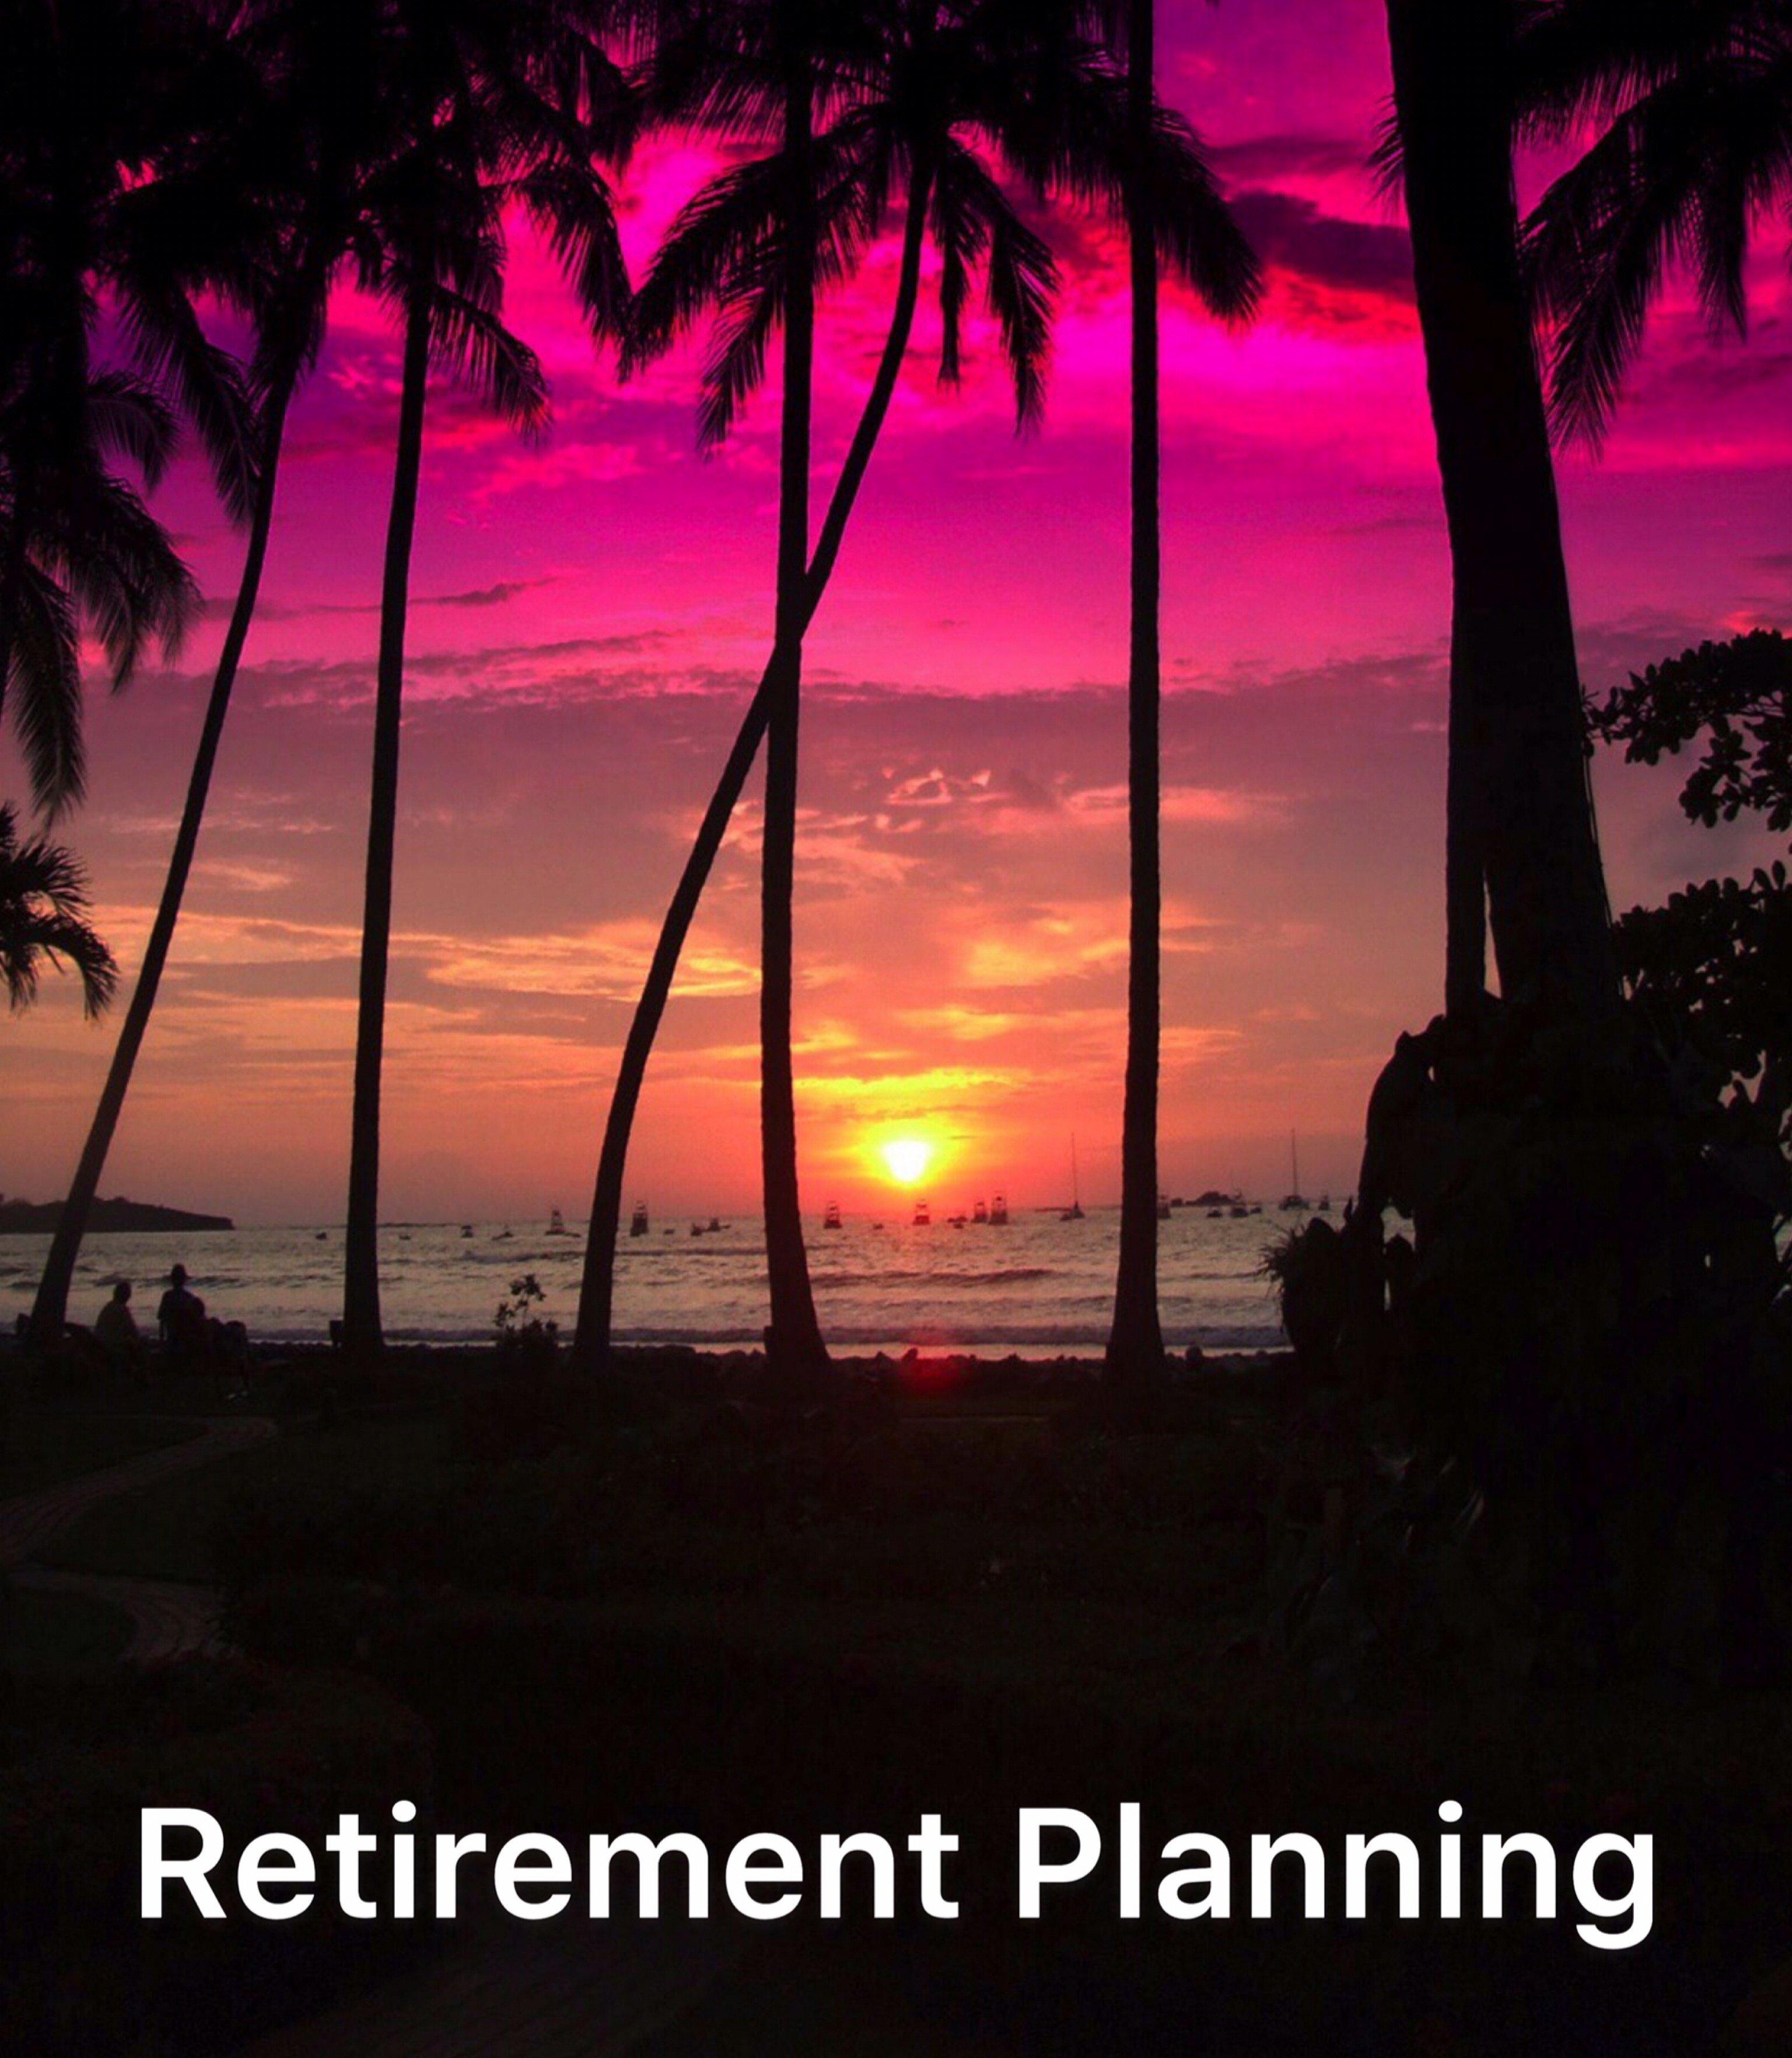 Retirement Planning 2